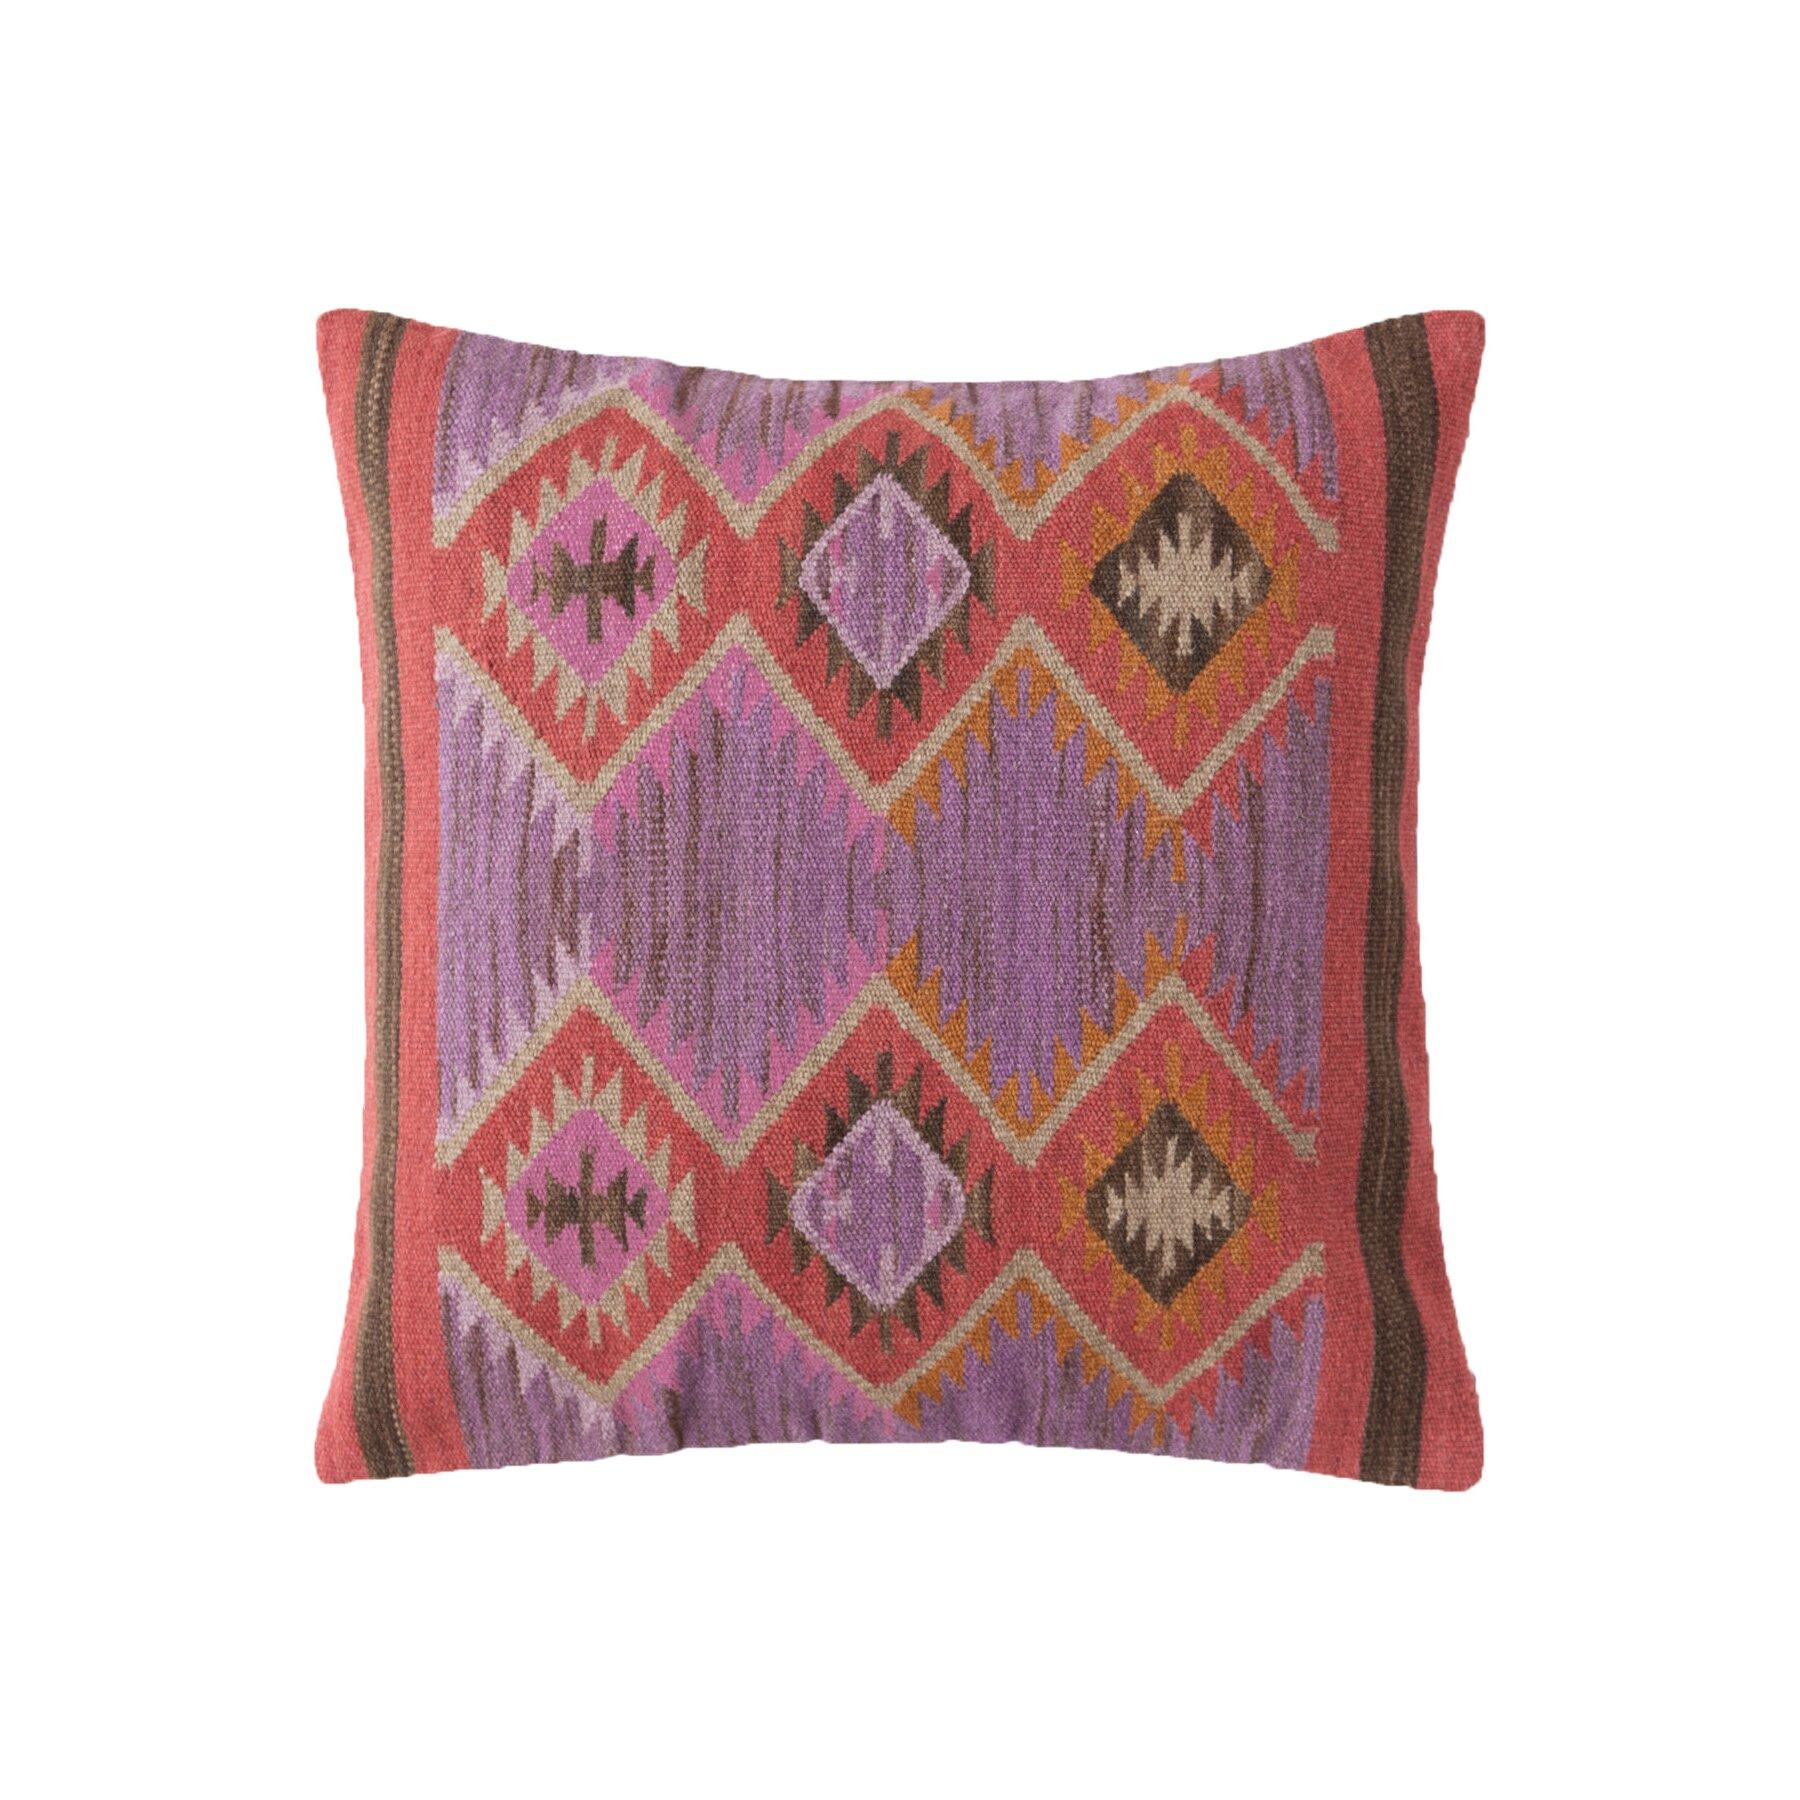 Dash and albert rugs rhapsody euro pillow allmodern for Dash and albert blanket